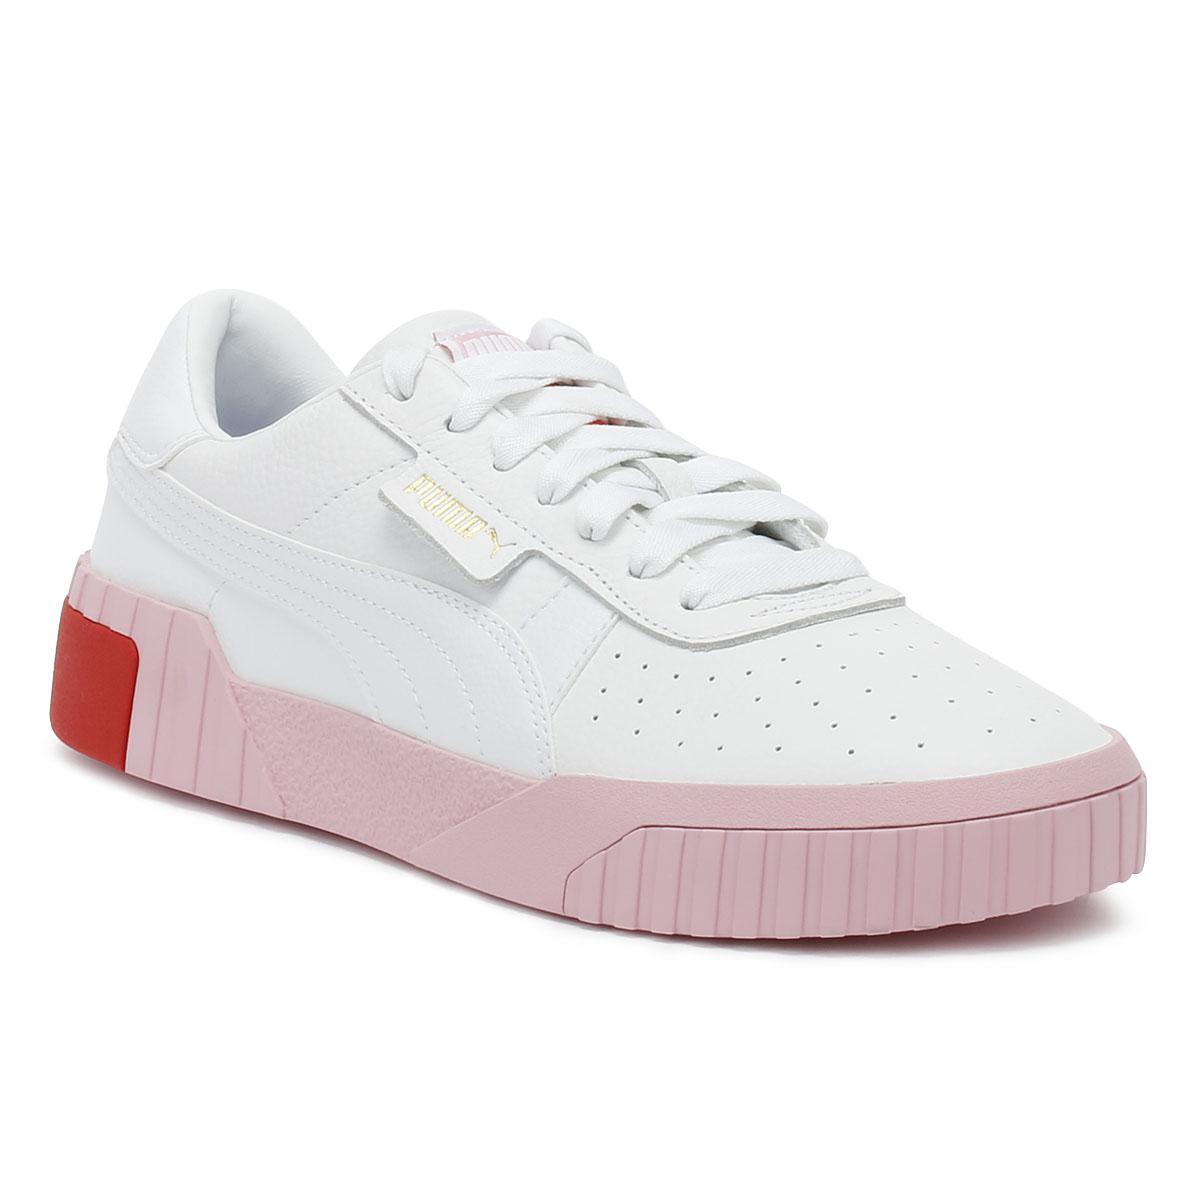 ... detailing Lyst - Puma Cali Womens White Pale Pink Trainers in White  2d8b2 e43f4 ... 4a39944f0